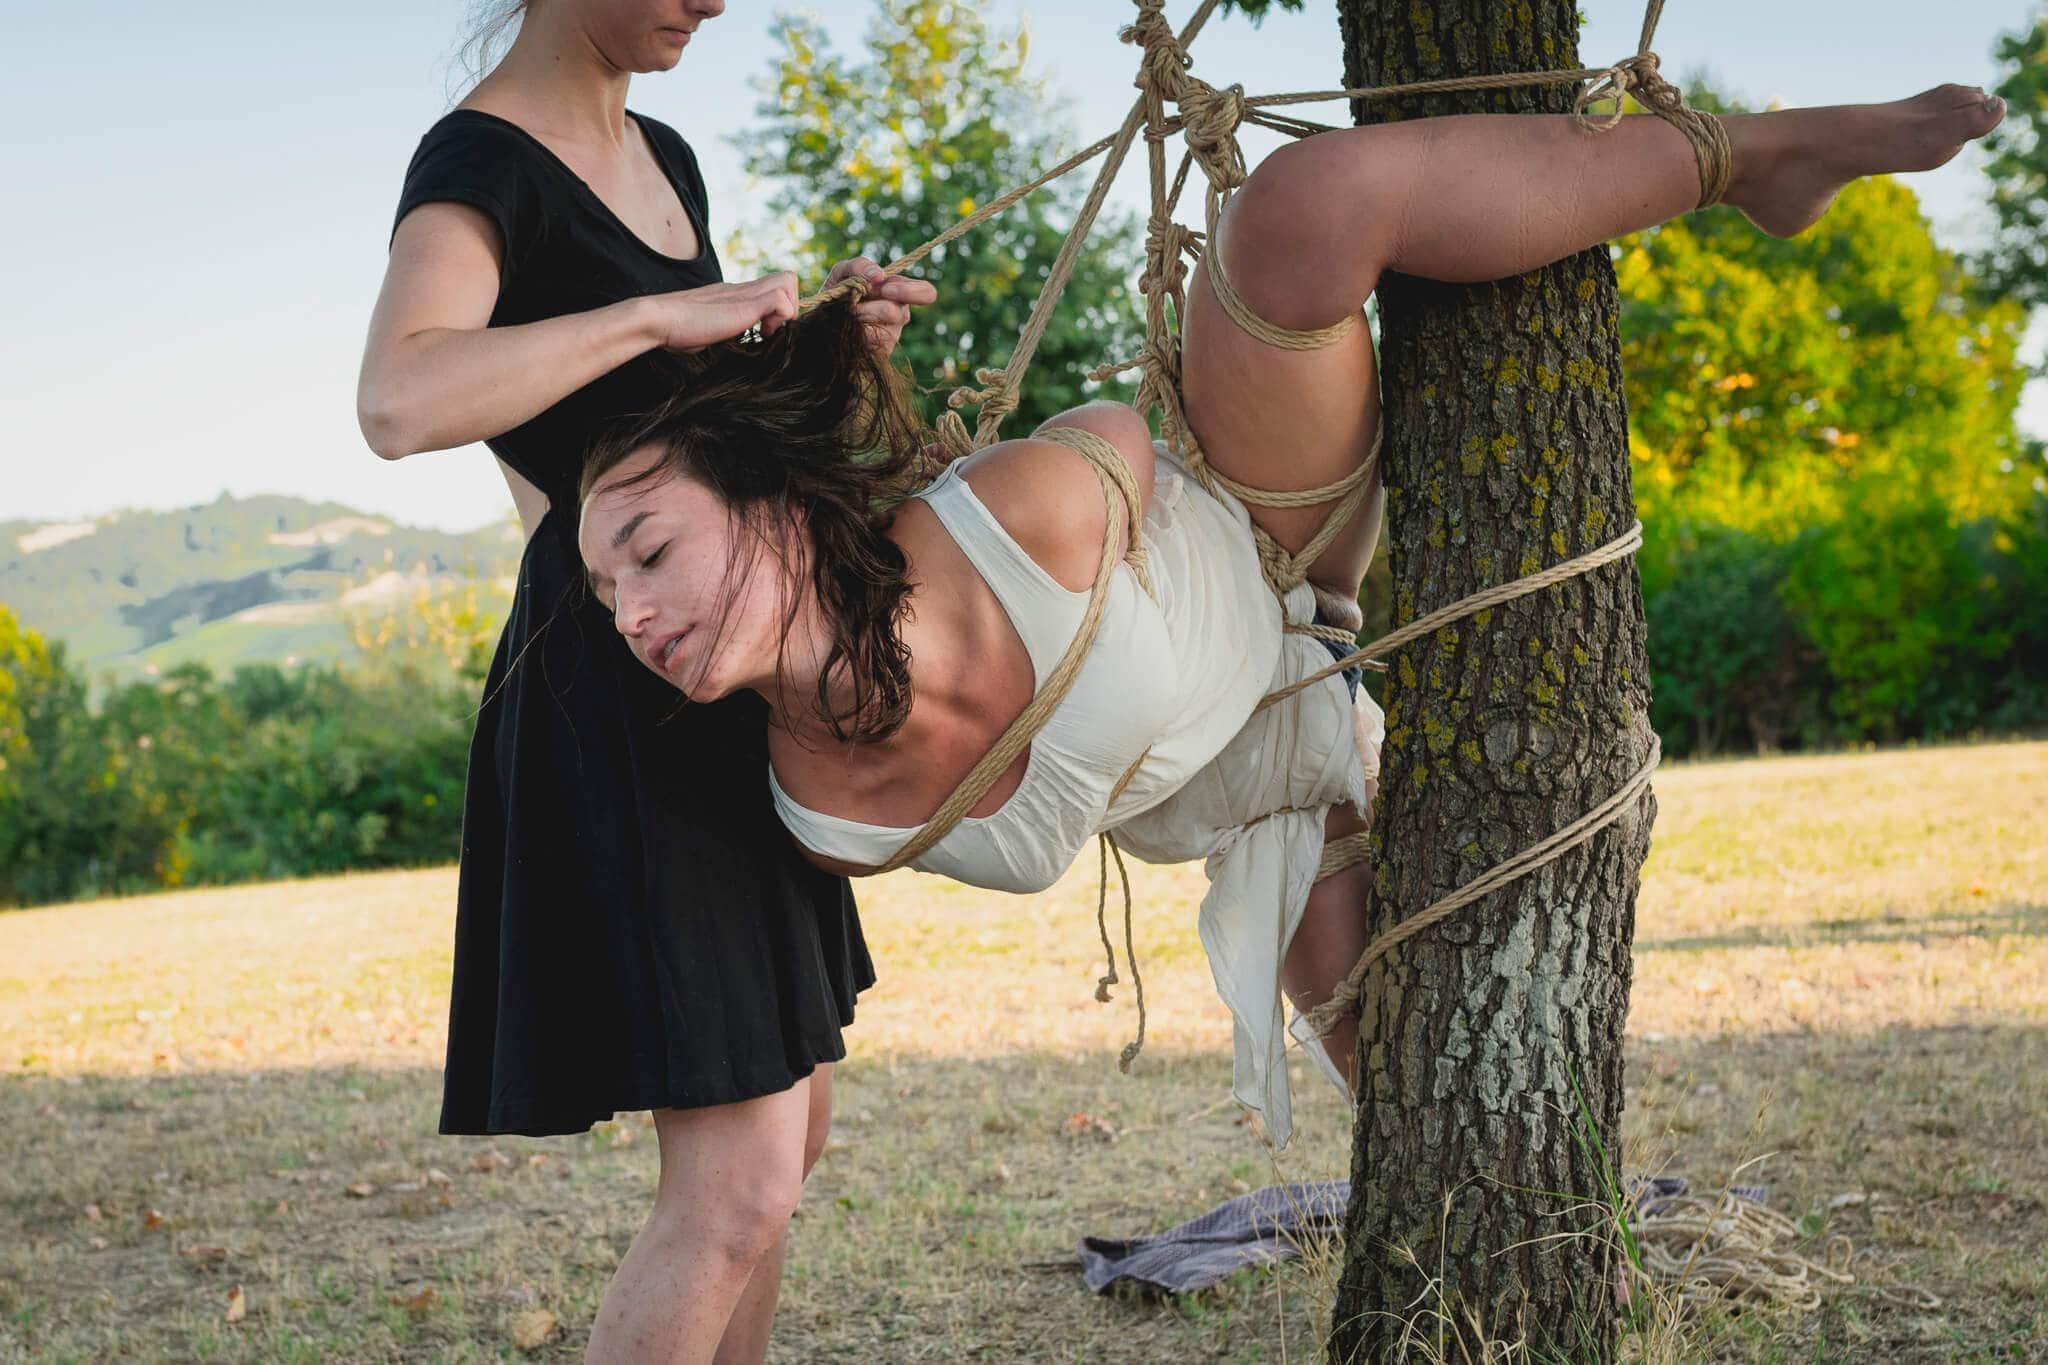 vigneti-kinbaku-bondage-shibari